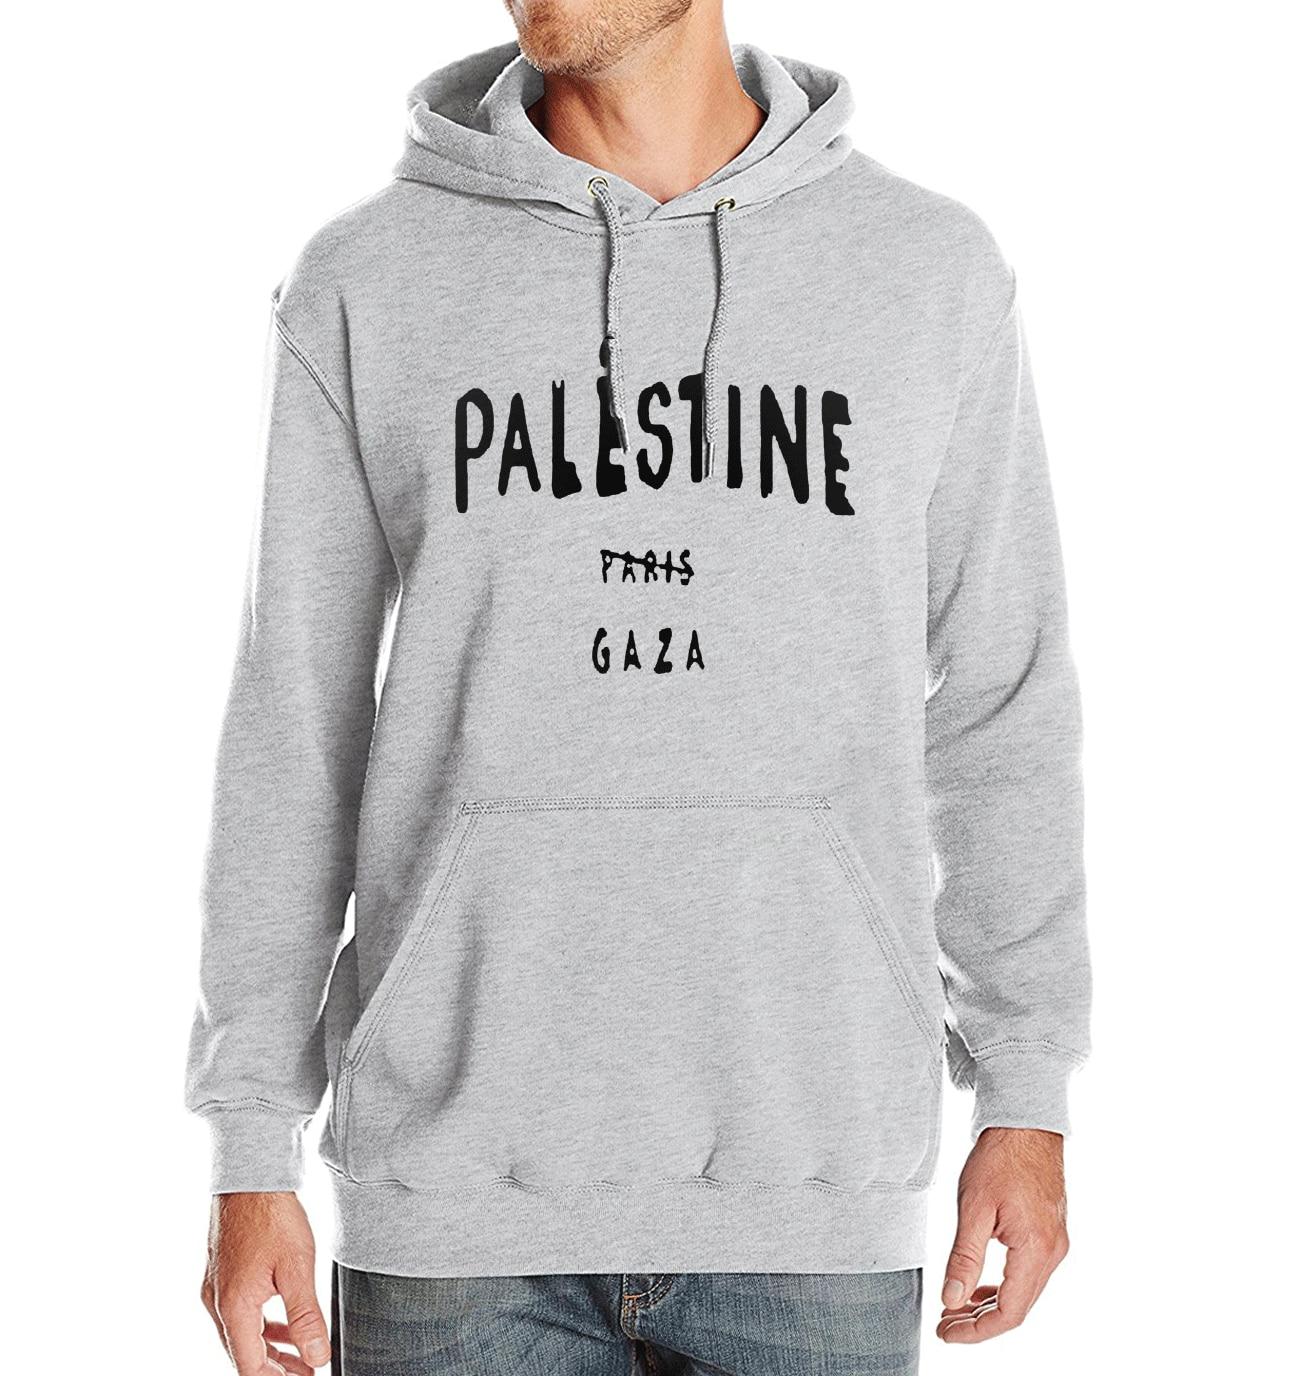 Hoodie Men Sweatshirts 2017 Spring Winter Fleece Letter Printed Palestine Paris Gaza Fashion Casual Men's Sportswear Brand Hot